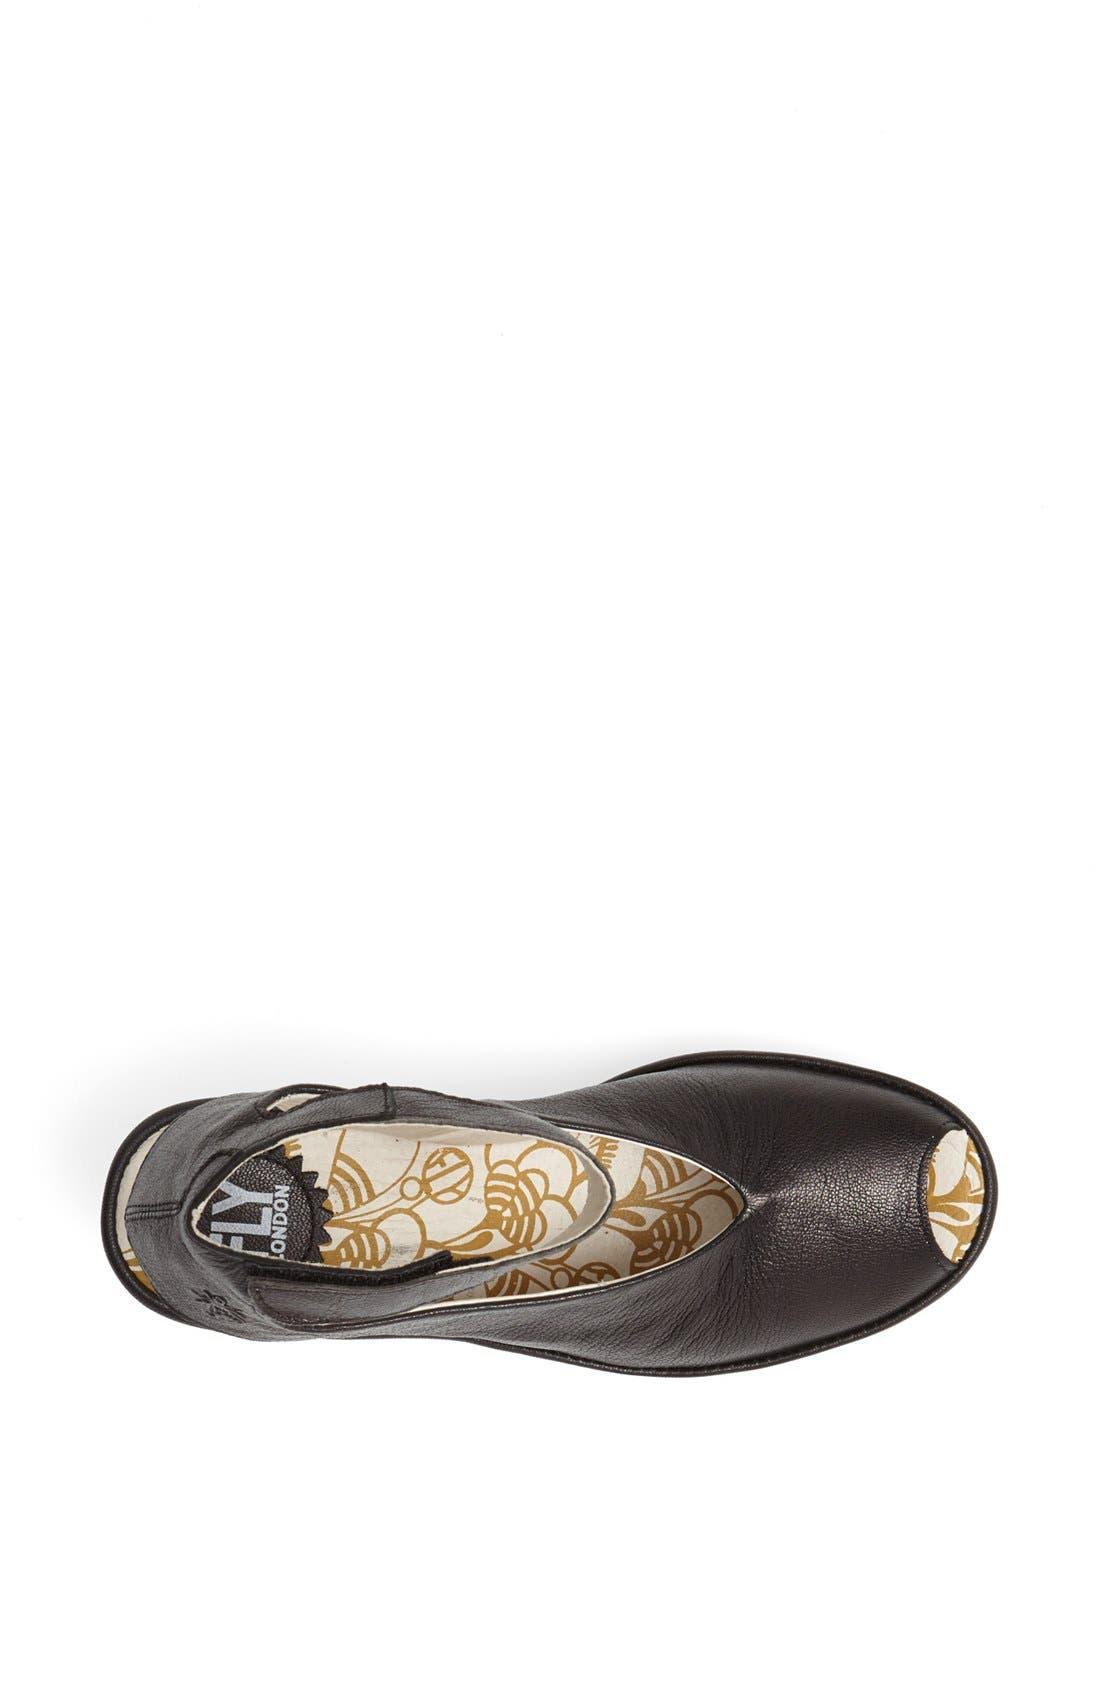 Alternate Image 3  - Fly London 'Yala' Sandal